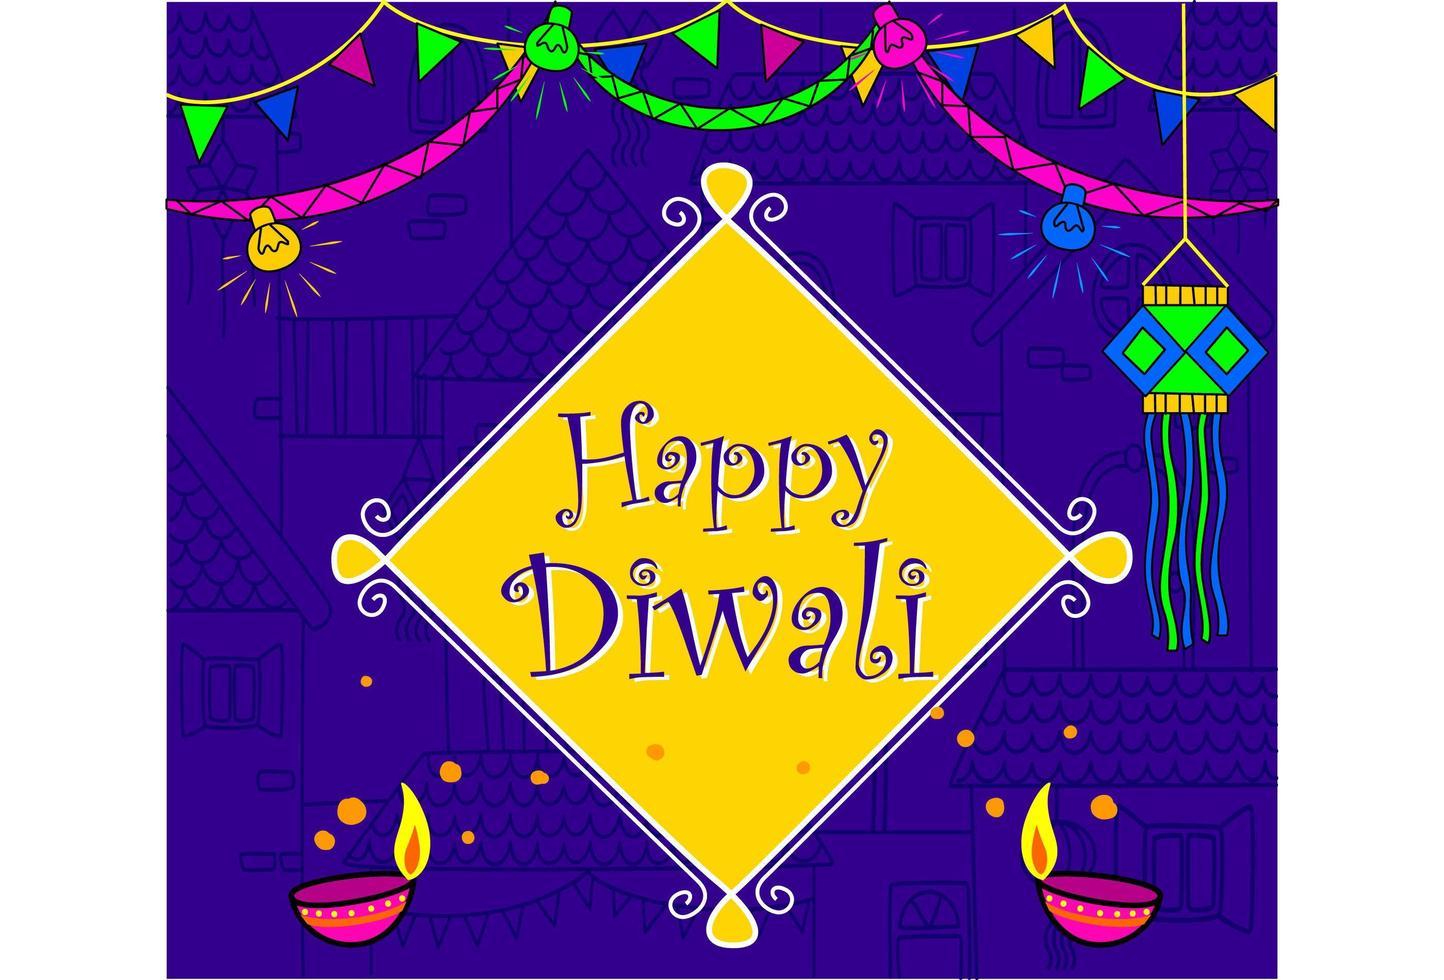 Indian Festival Diwali Wallpaper in Neon Color vector